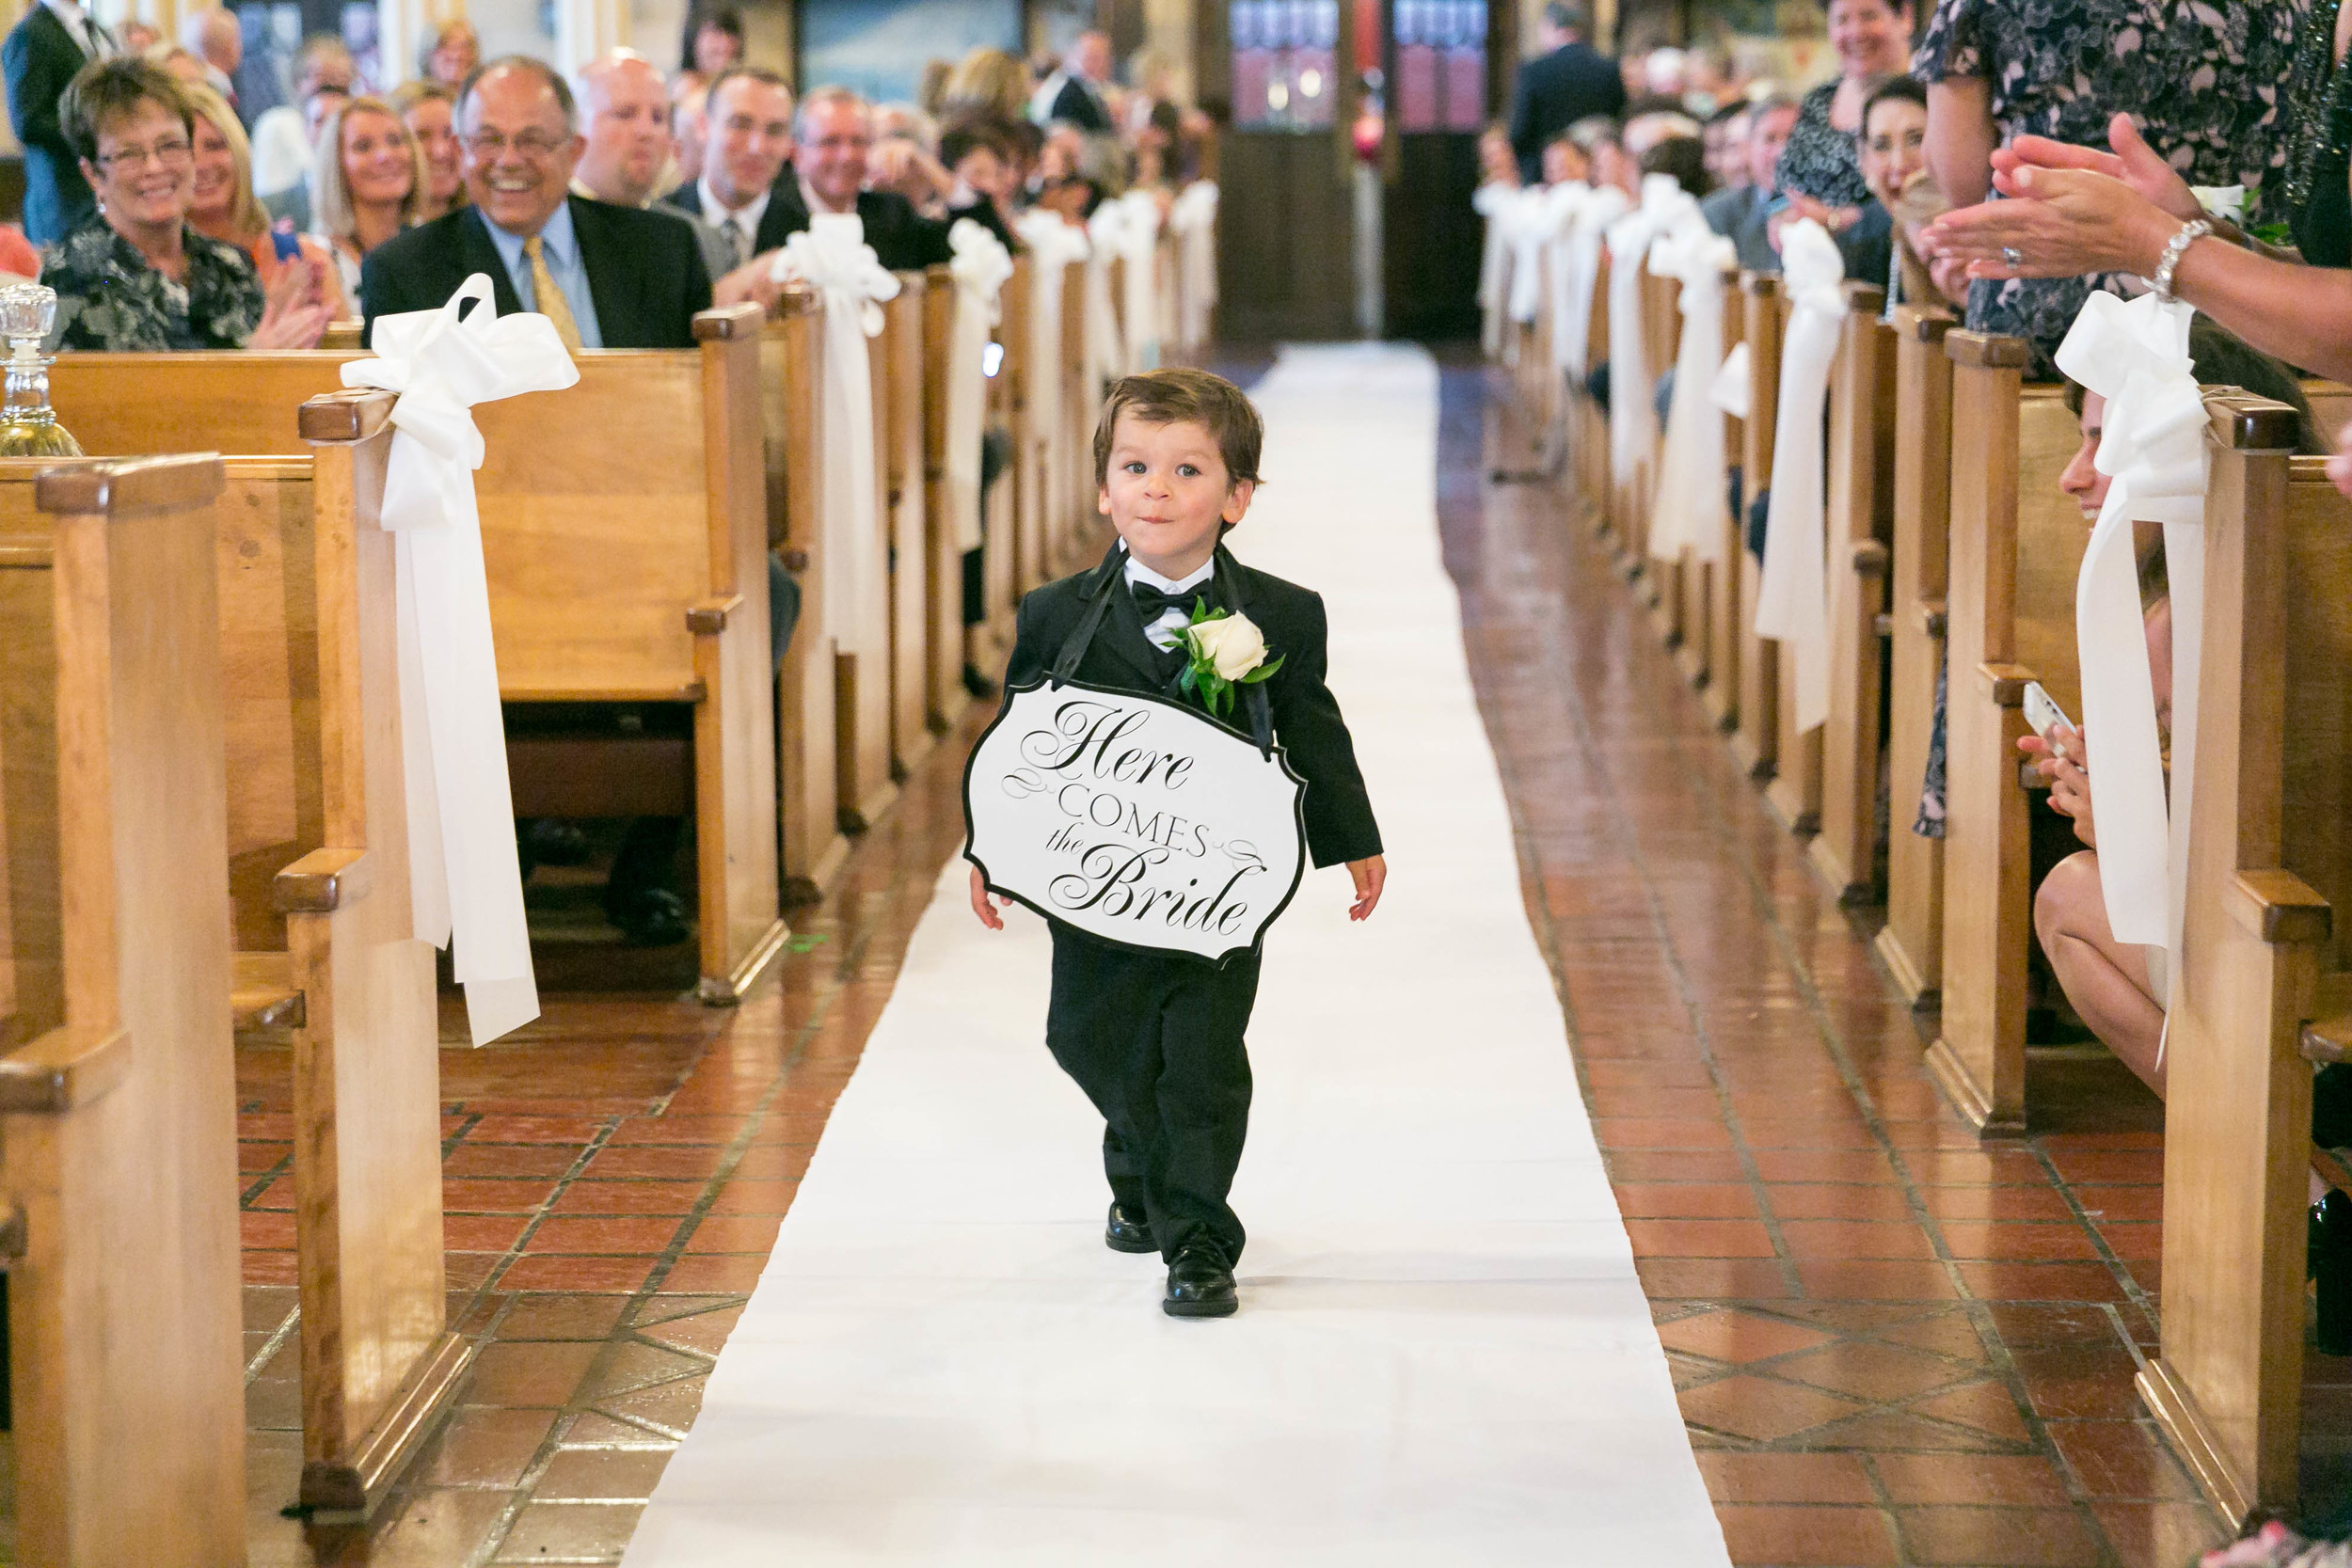 Summer-American-Wedding-Anthonys-Ocean-View-New-Haven-Documentary-Wedding-Photographer-Jacek-Dolata-4.jpg